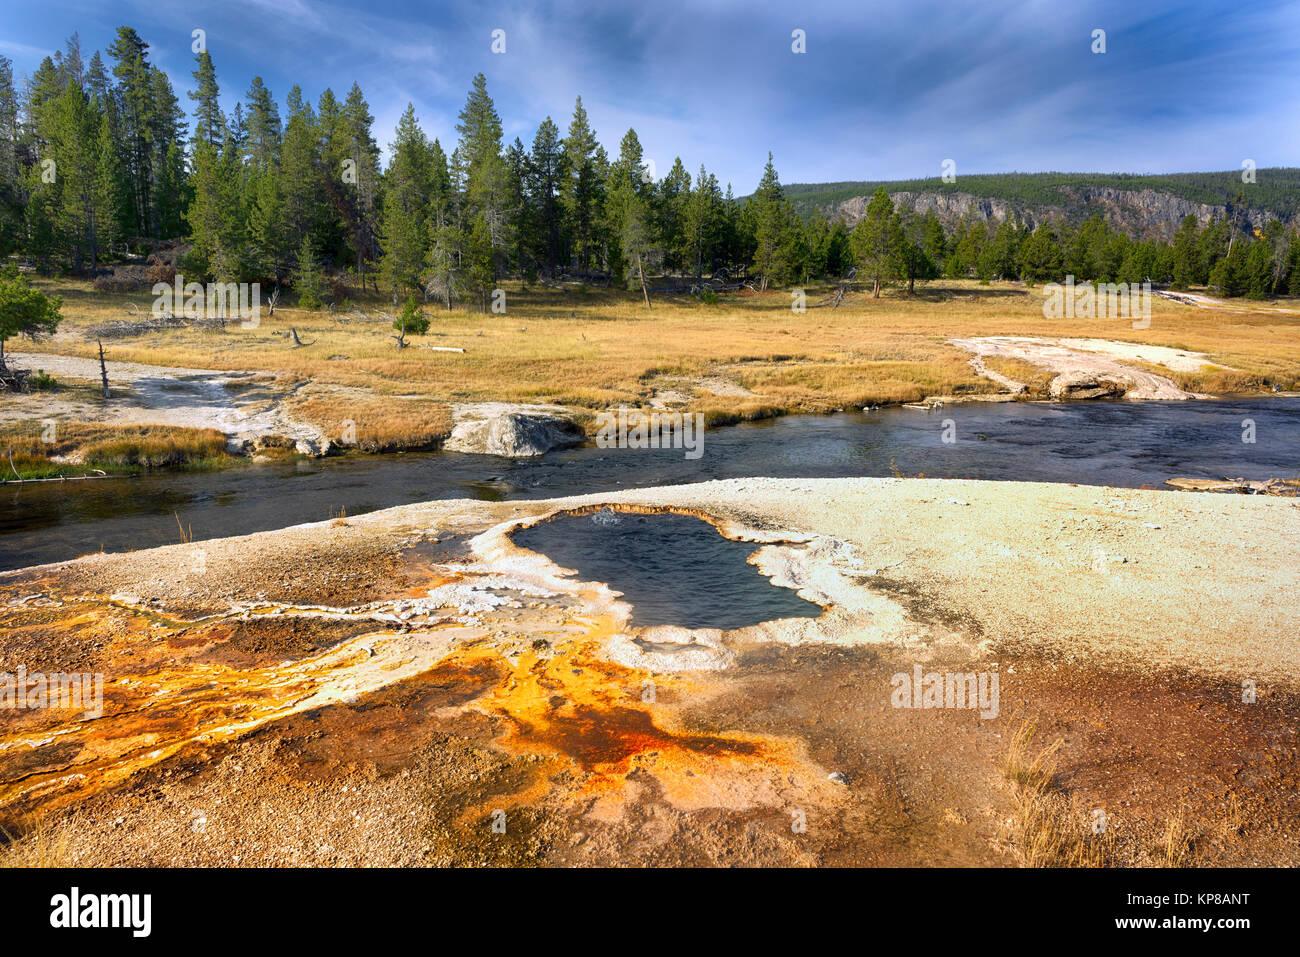 Río Firehole, Parque Nacional Yellowstone, Wyoming, Estados Unidos. El Firehole río fluye a través de varios importantes Foto de stock